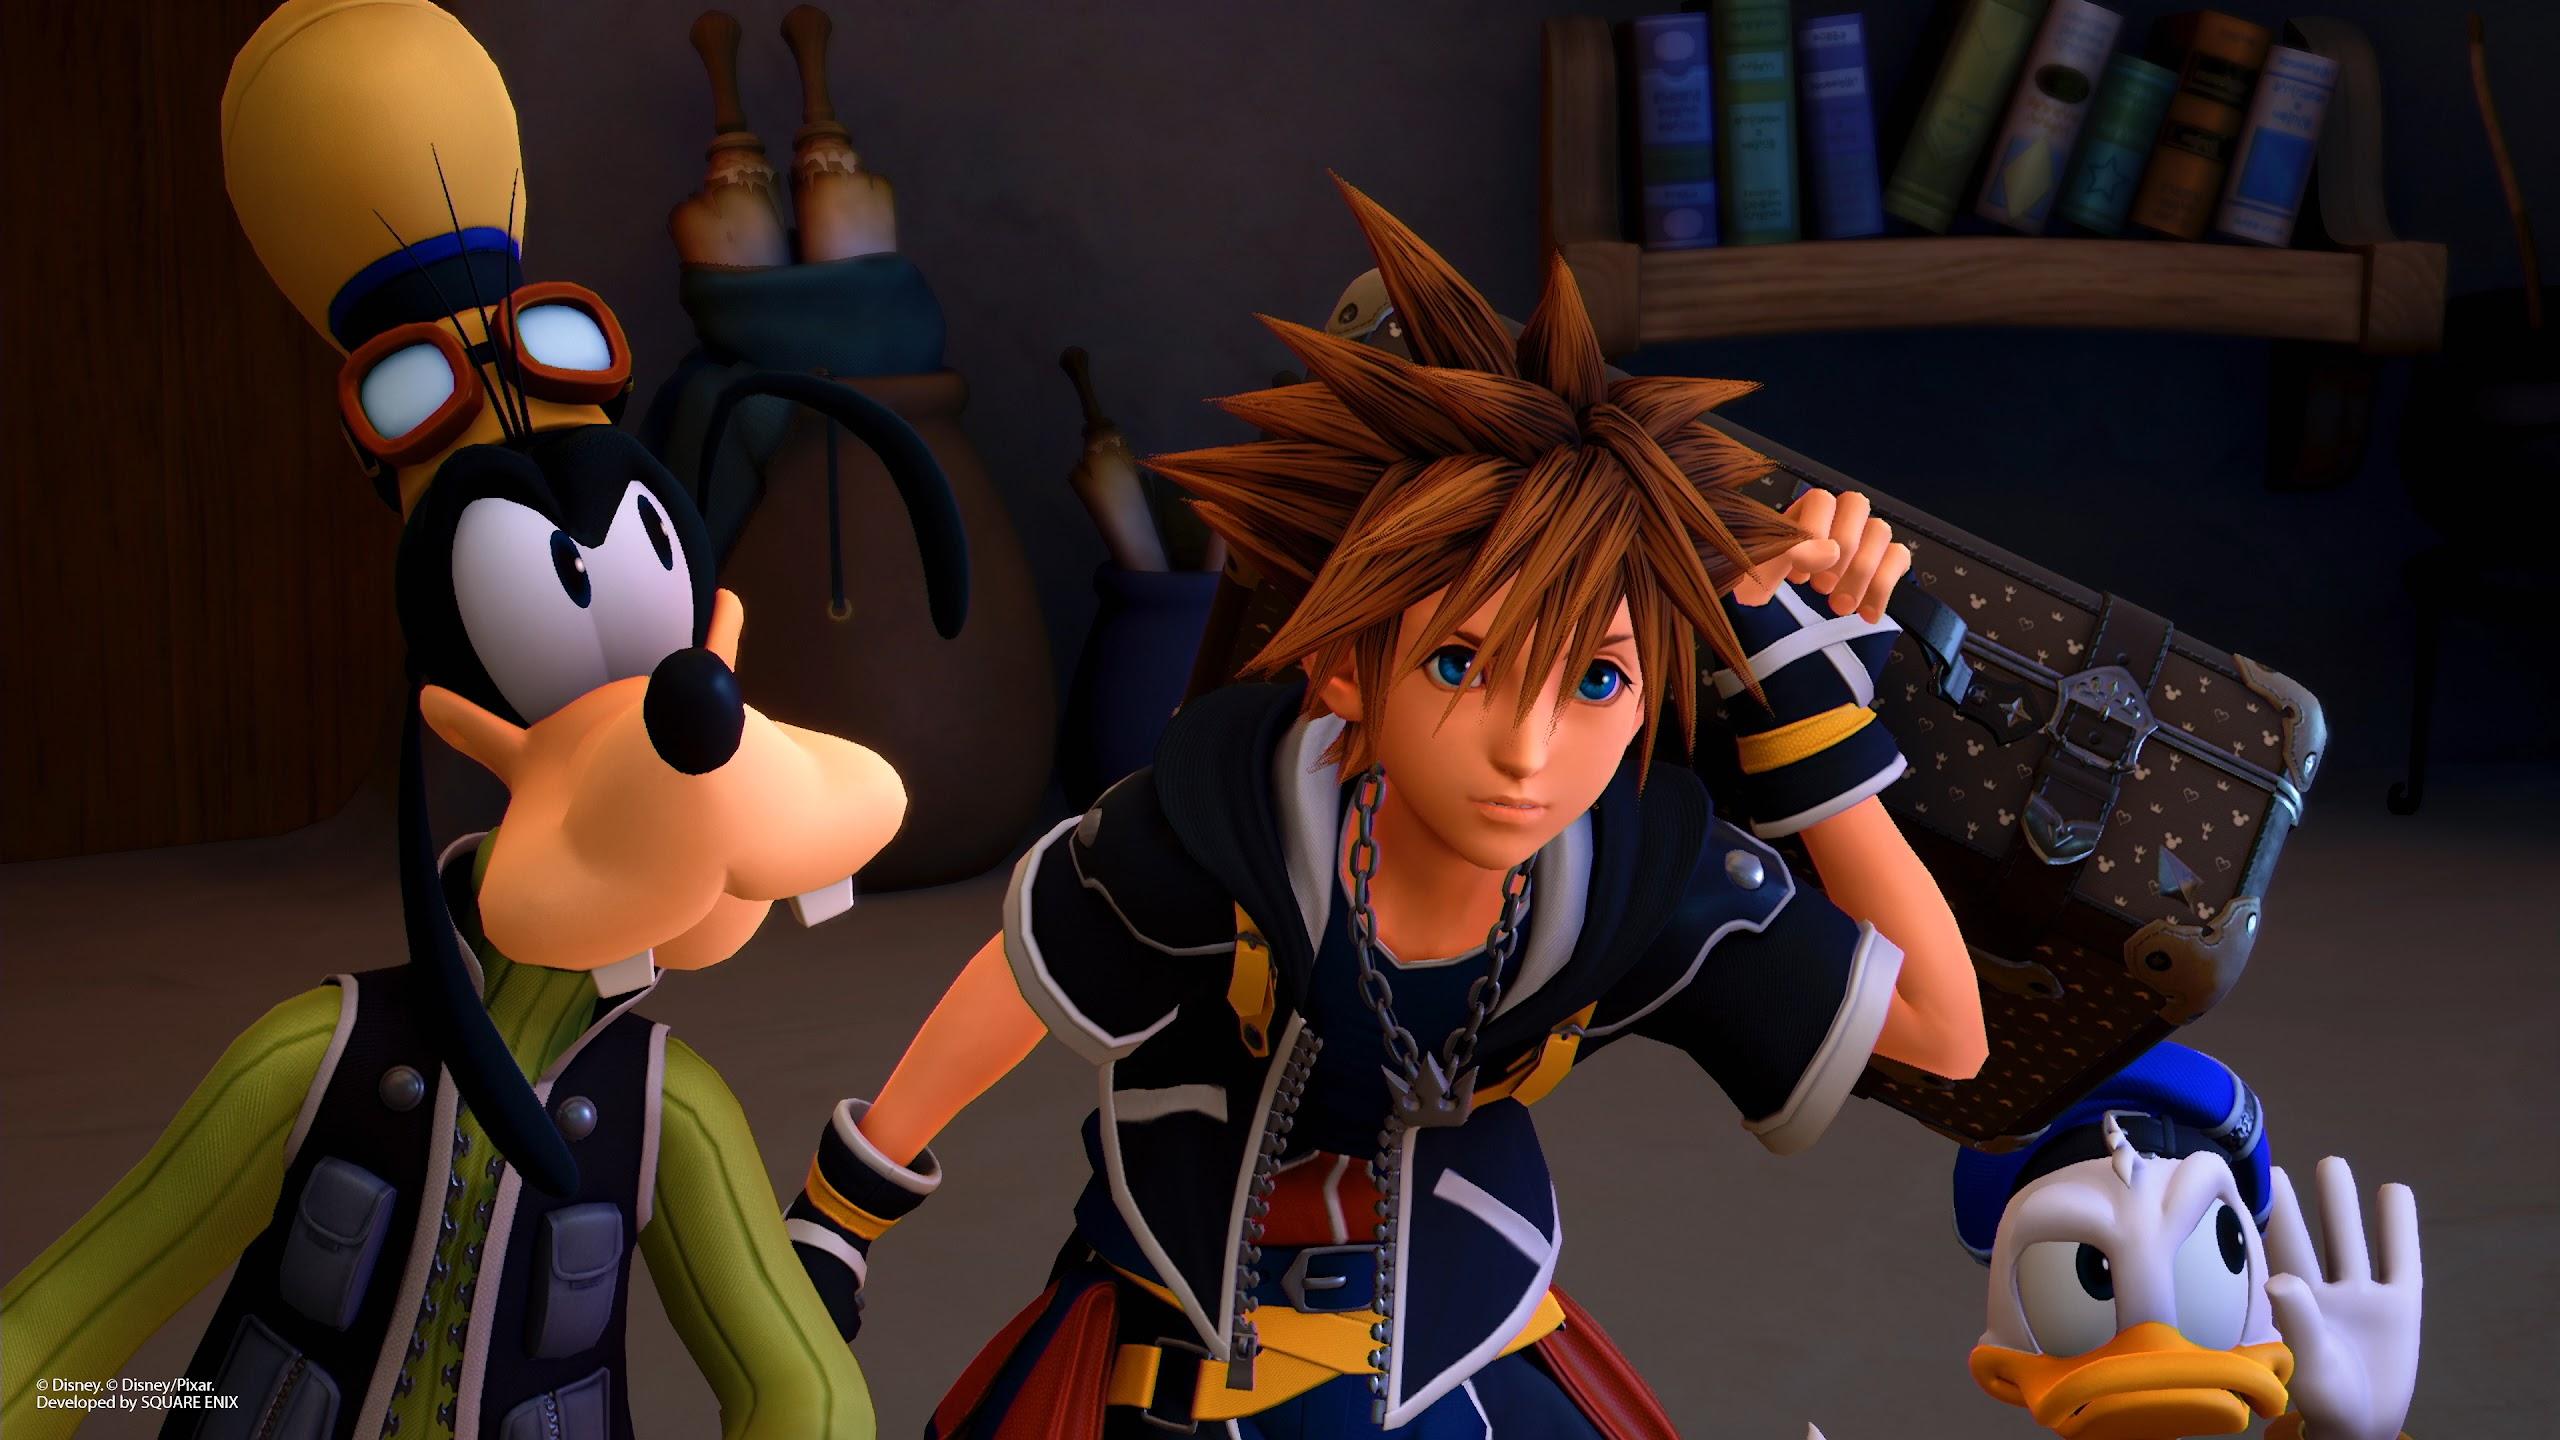 Kingdom Hearts 3 Sora 4k 3840x2160 Wallpaper 5